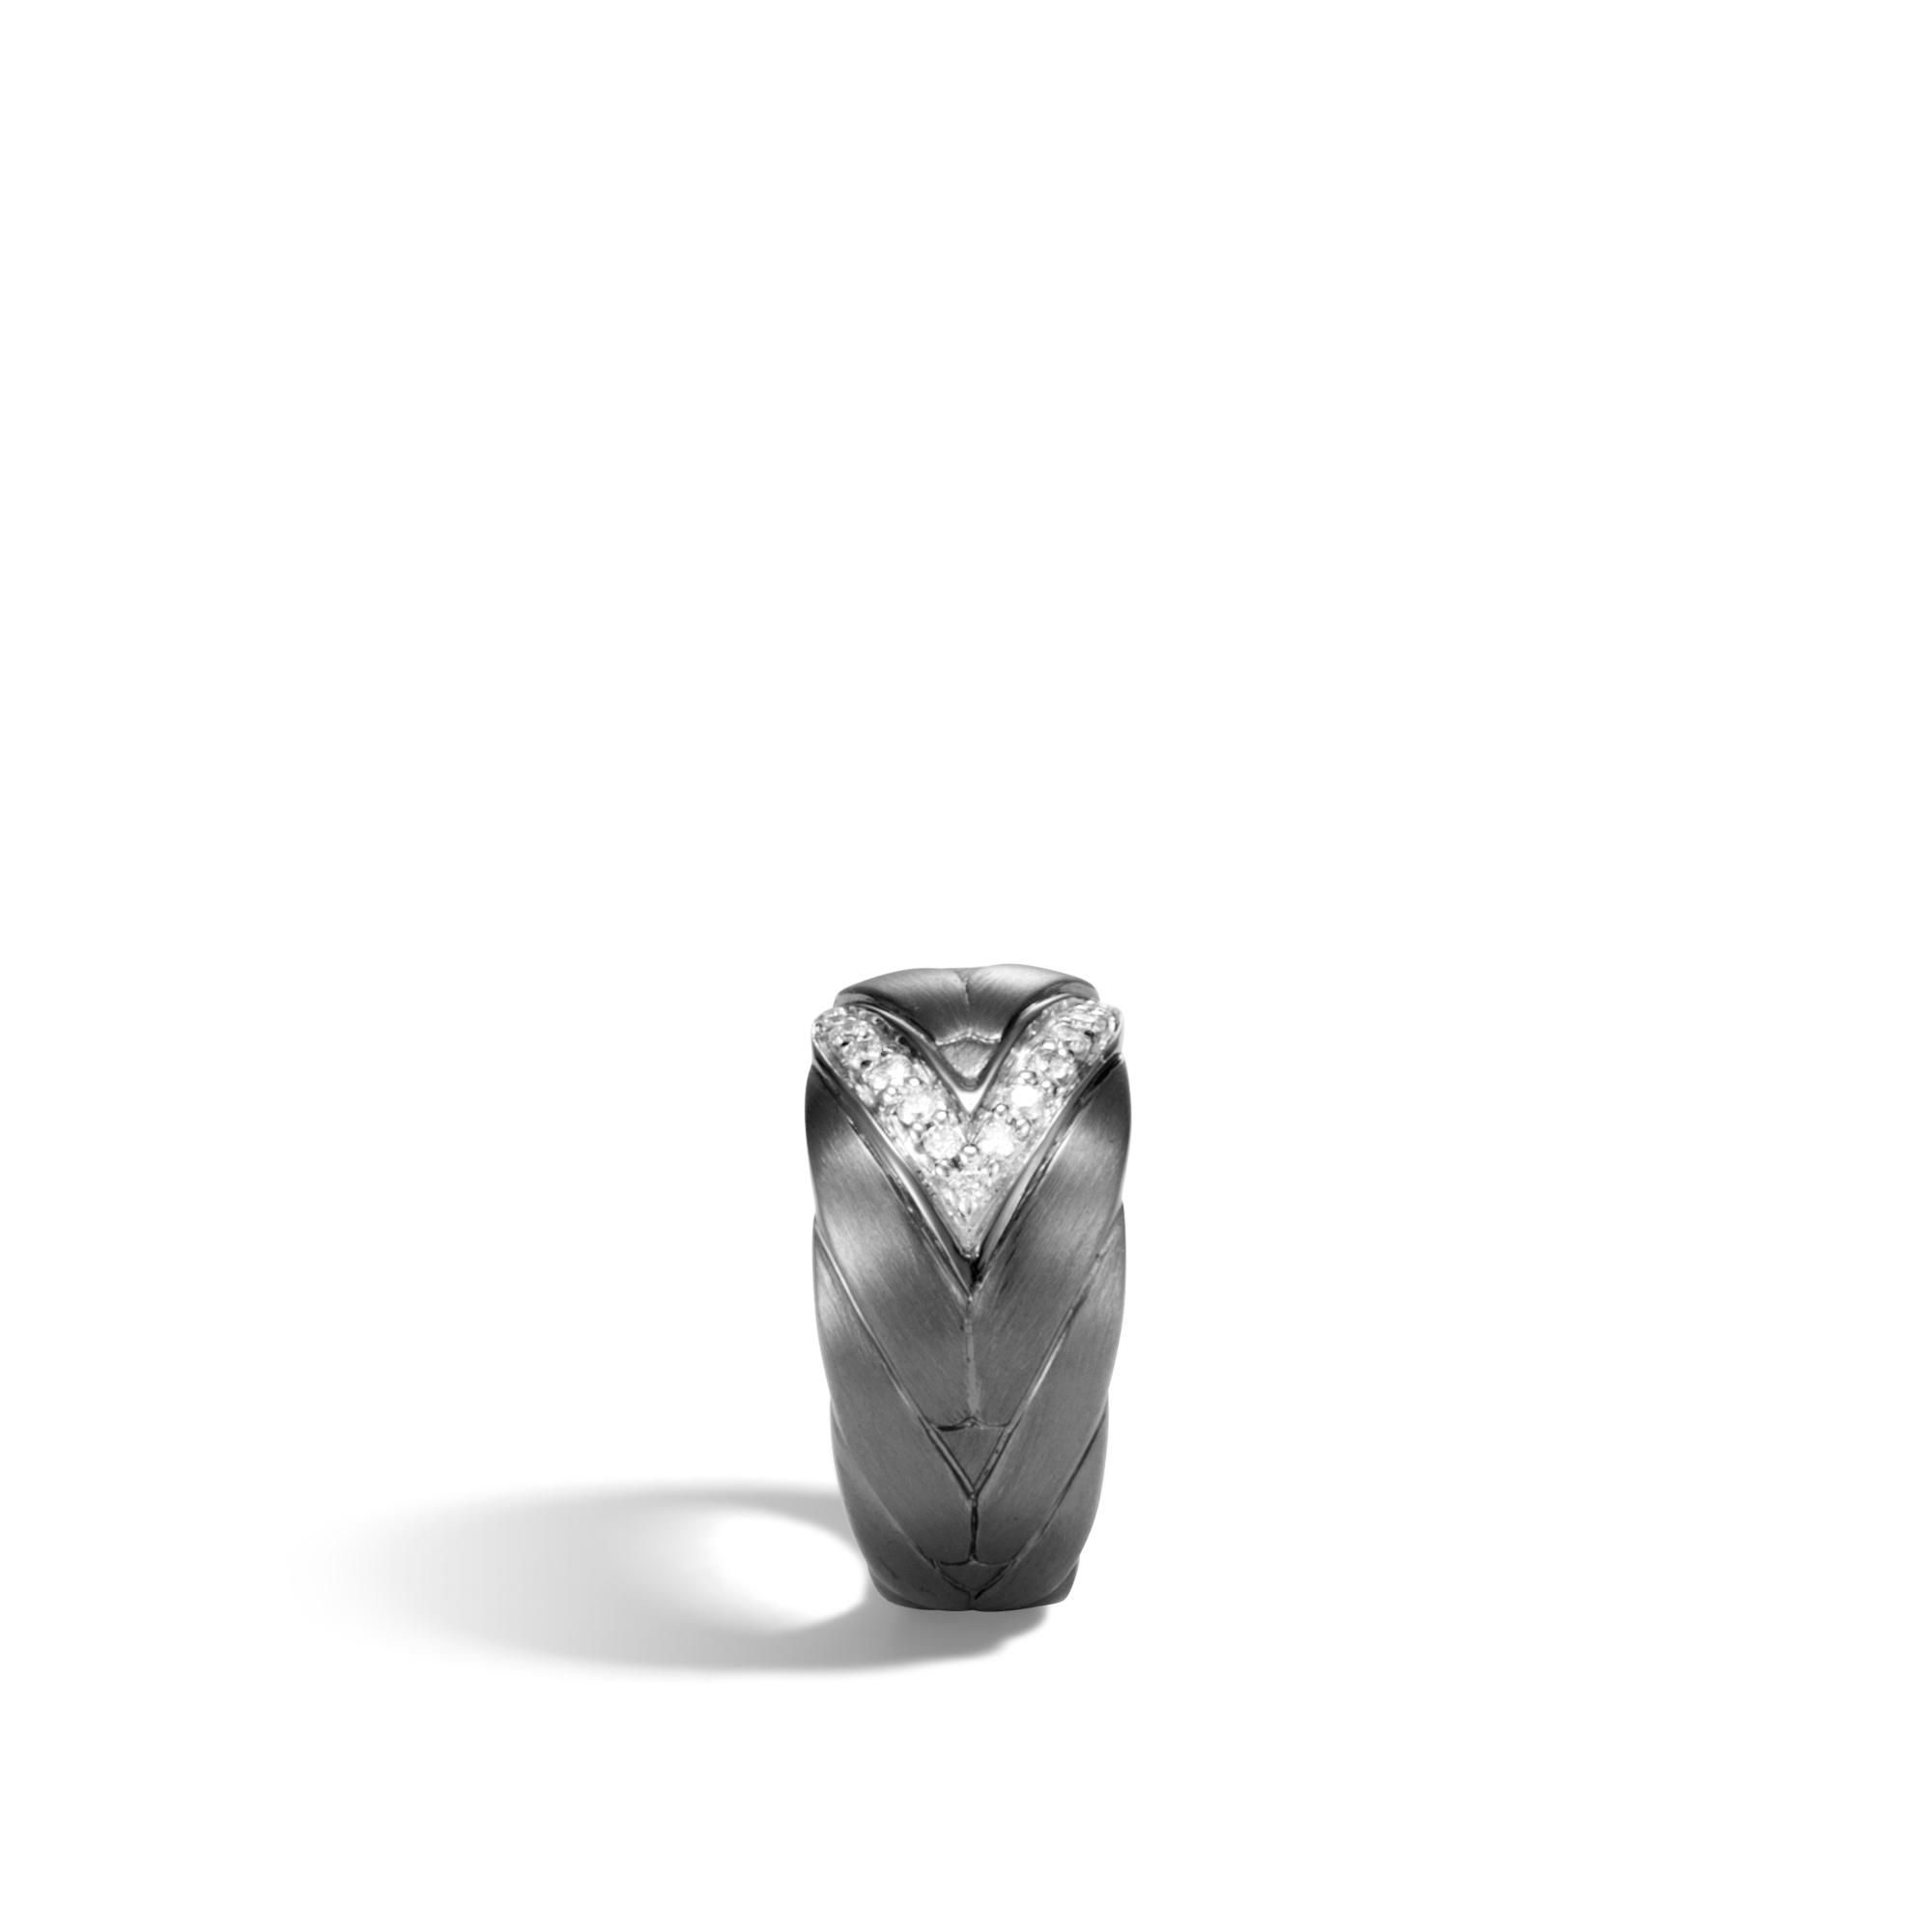 Modern Chain 12.5MM Ring in Blackened Silver, Diamonds, White Diamond, large